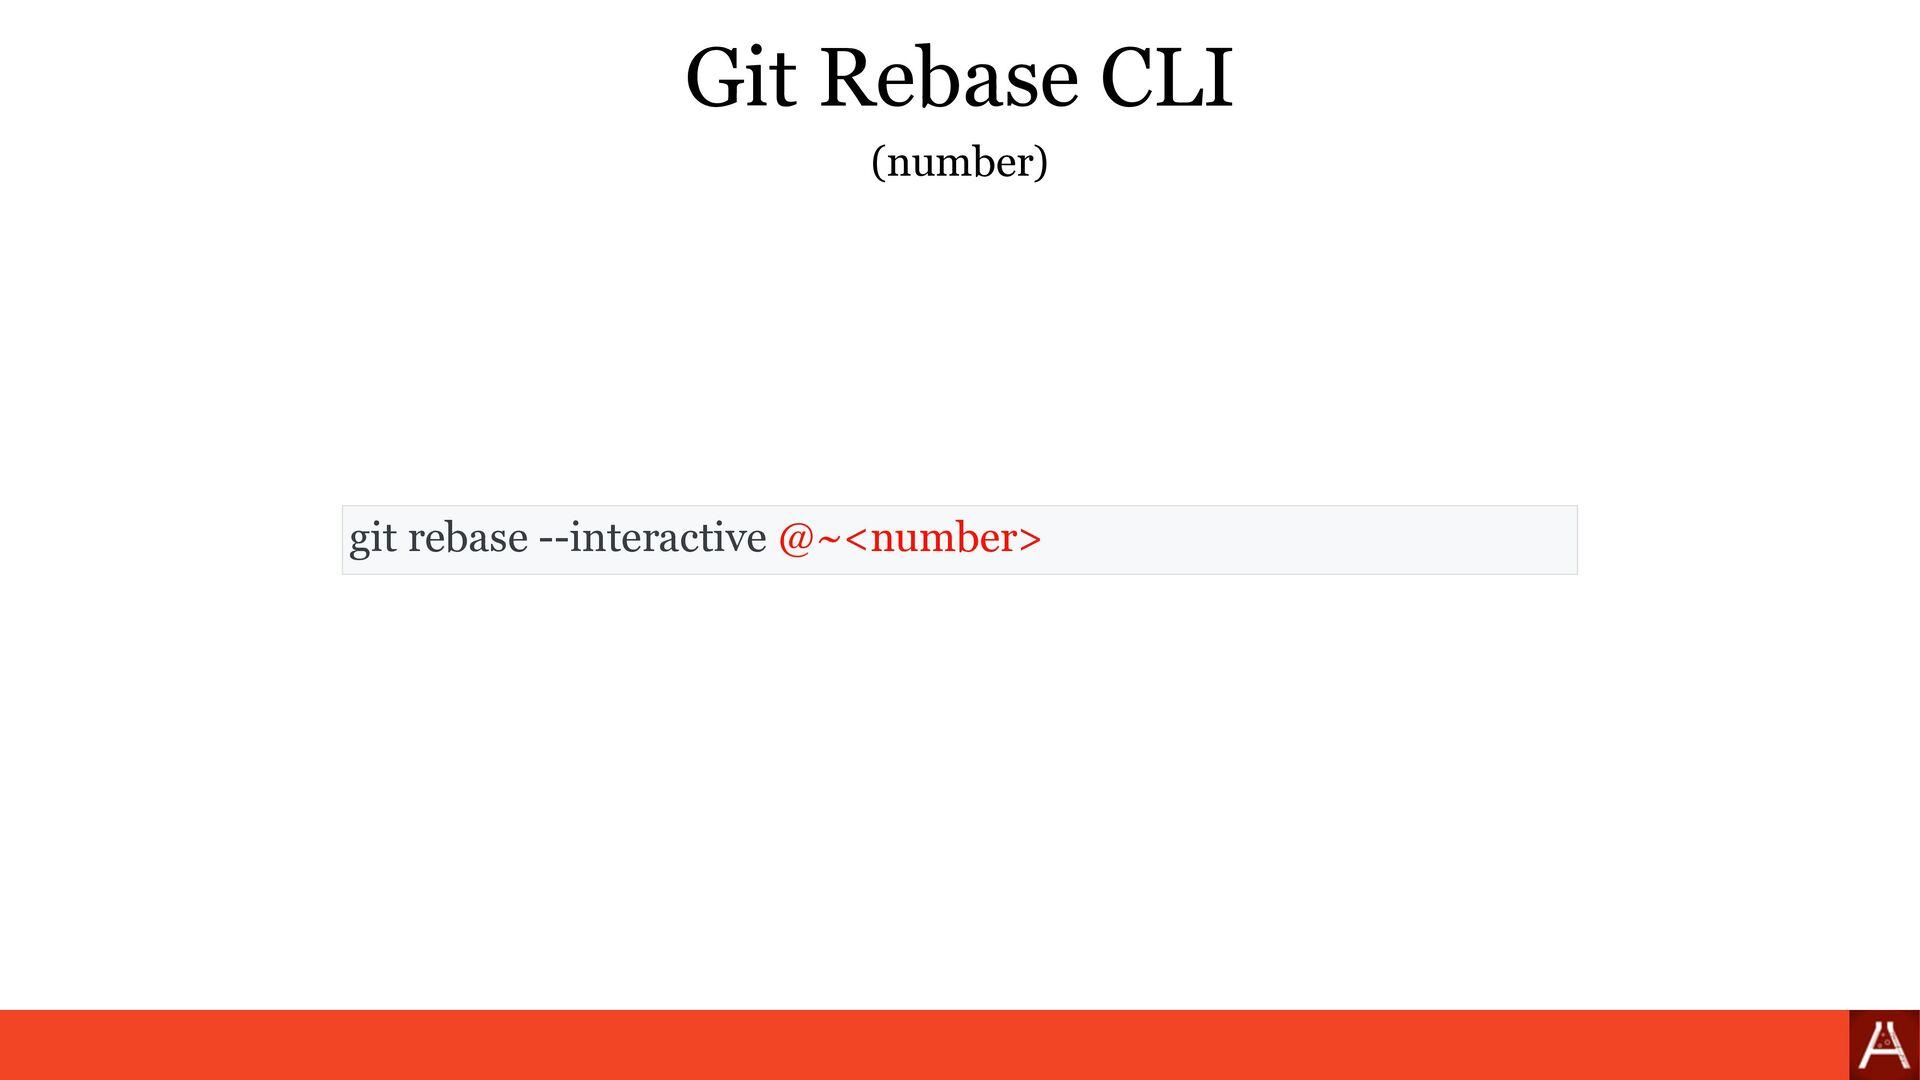 (by branch) git rebase --interactive <branch> G...